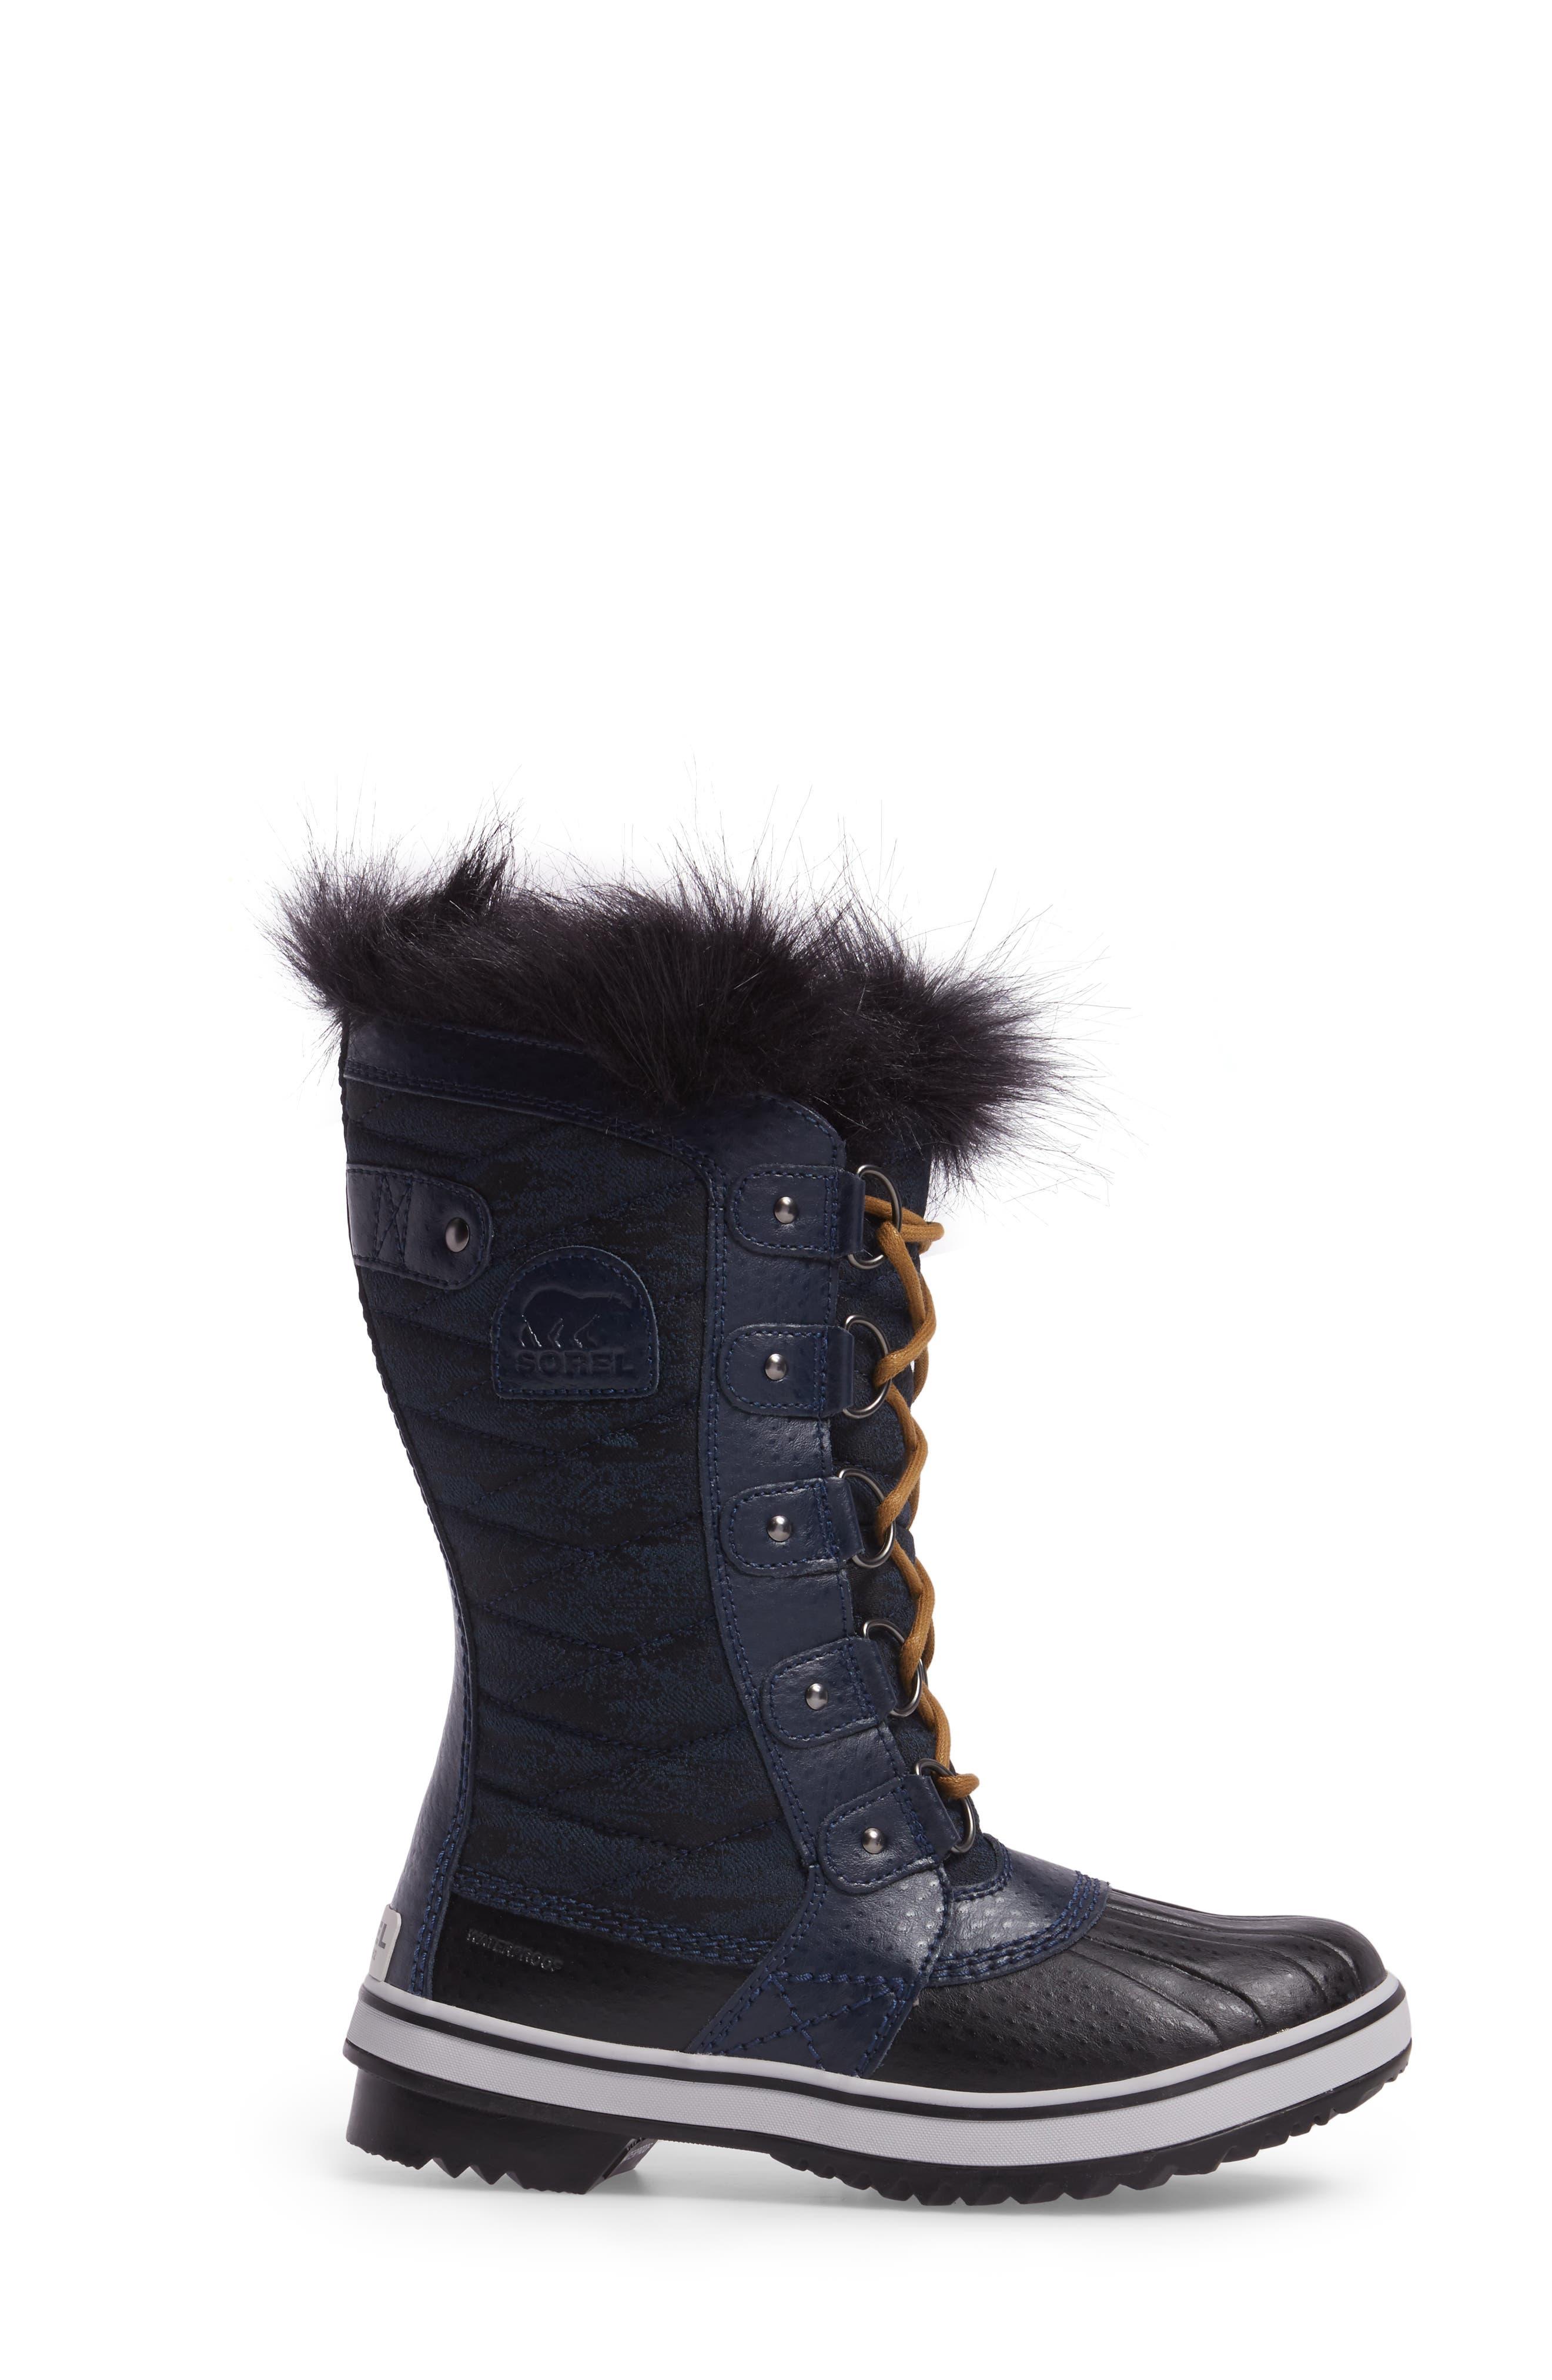 Tofino II Fleece Lined Waterproof Boot,                             Alternate thumbnail 3, color,